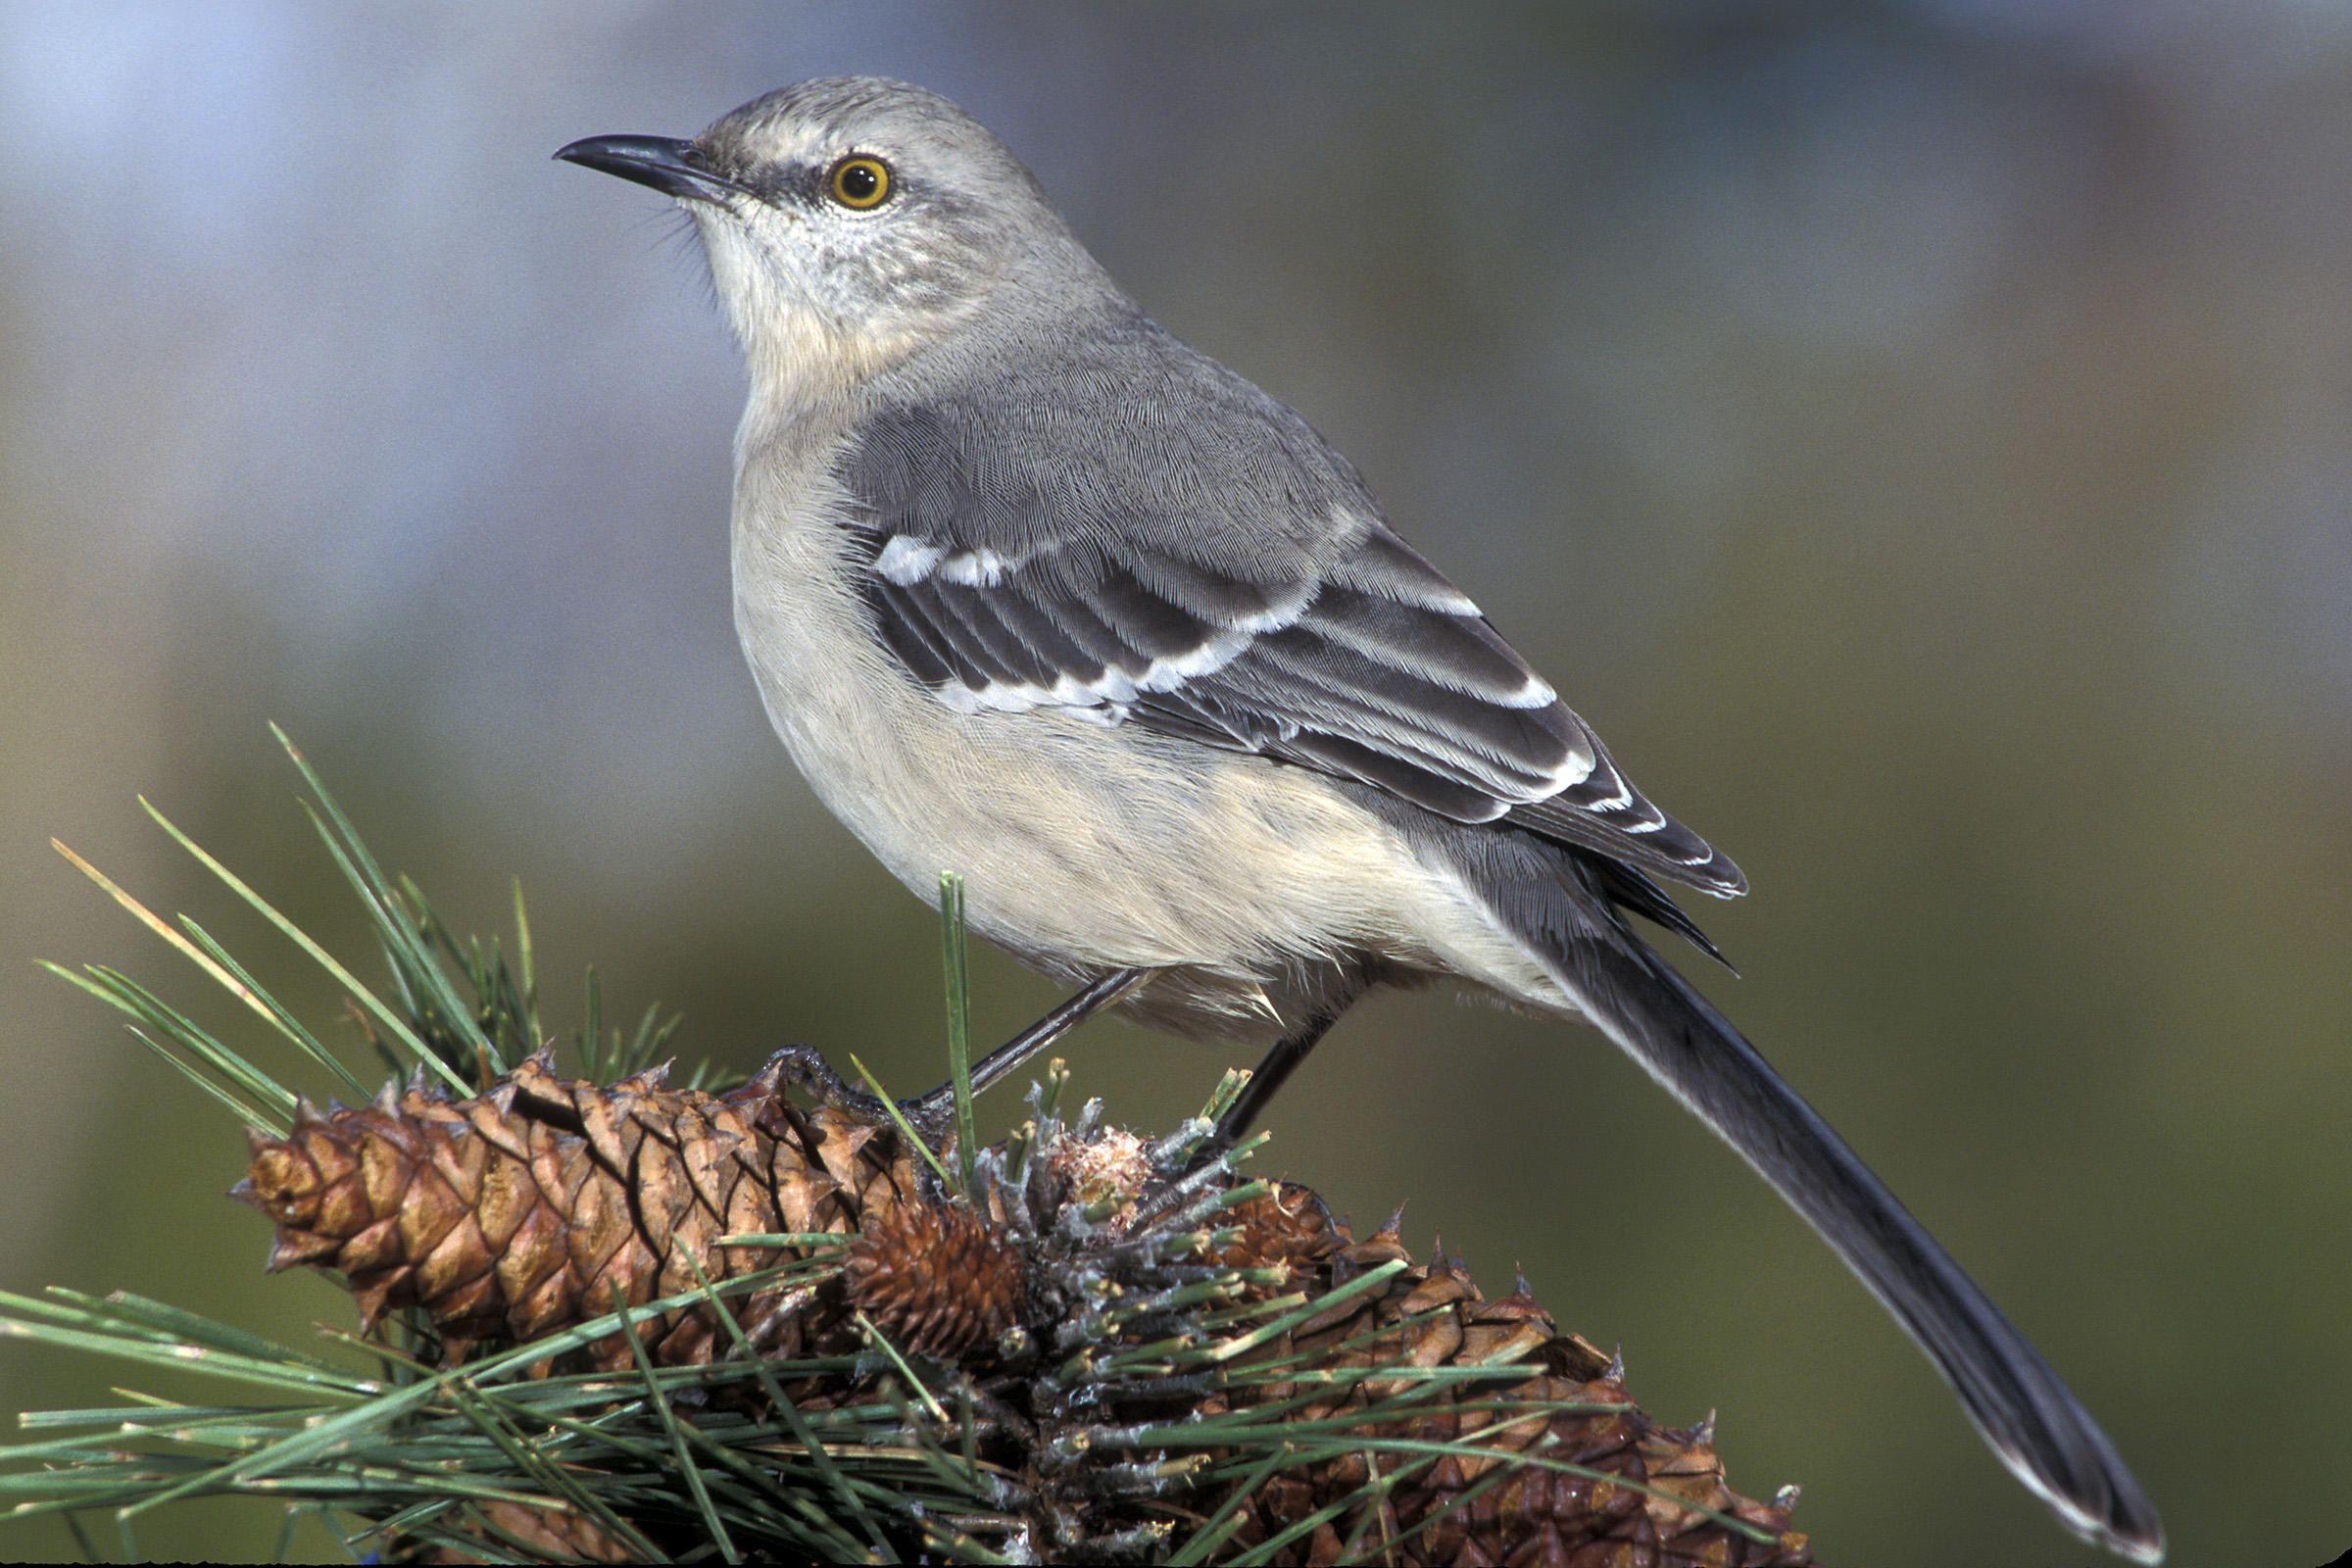 The northern mockingbird (Mimus polyglottos) is the state